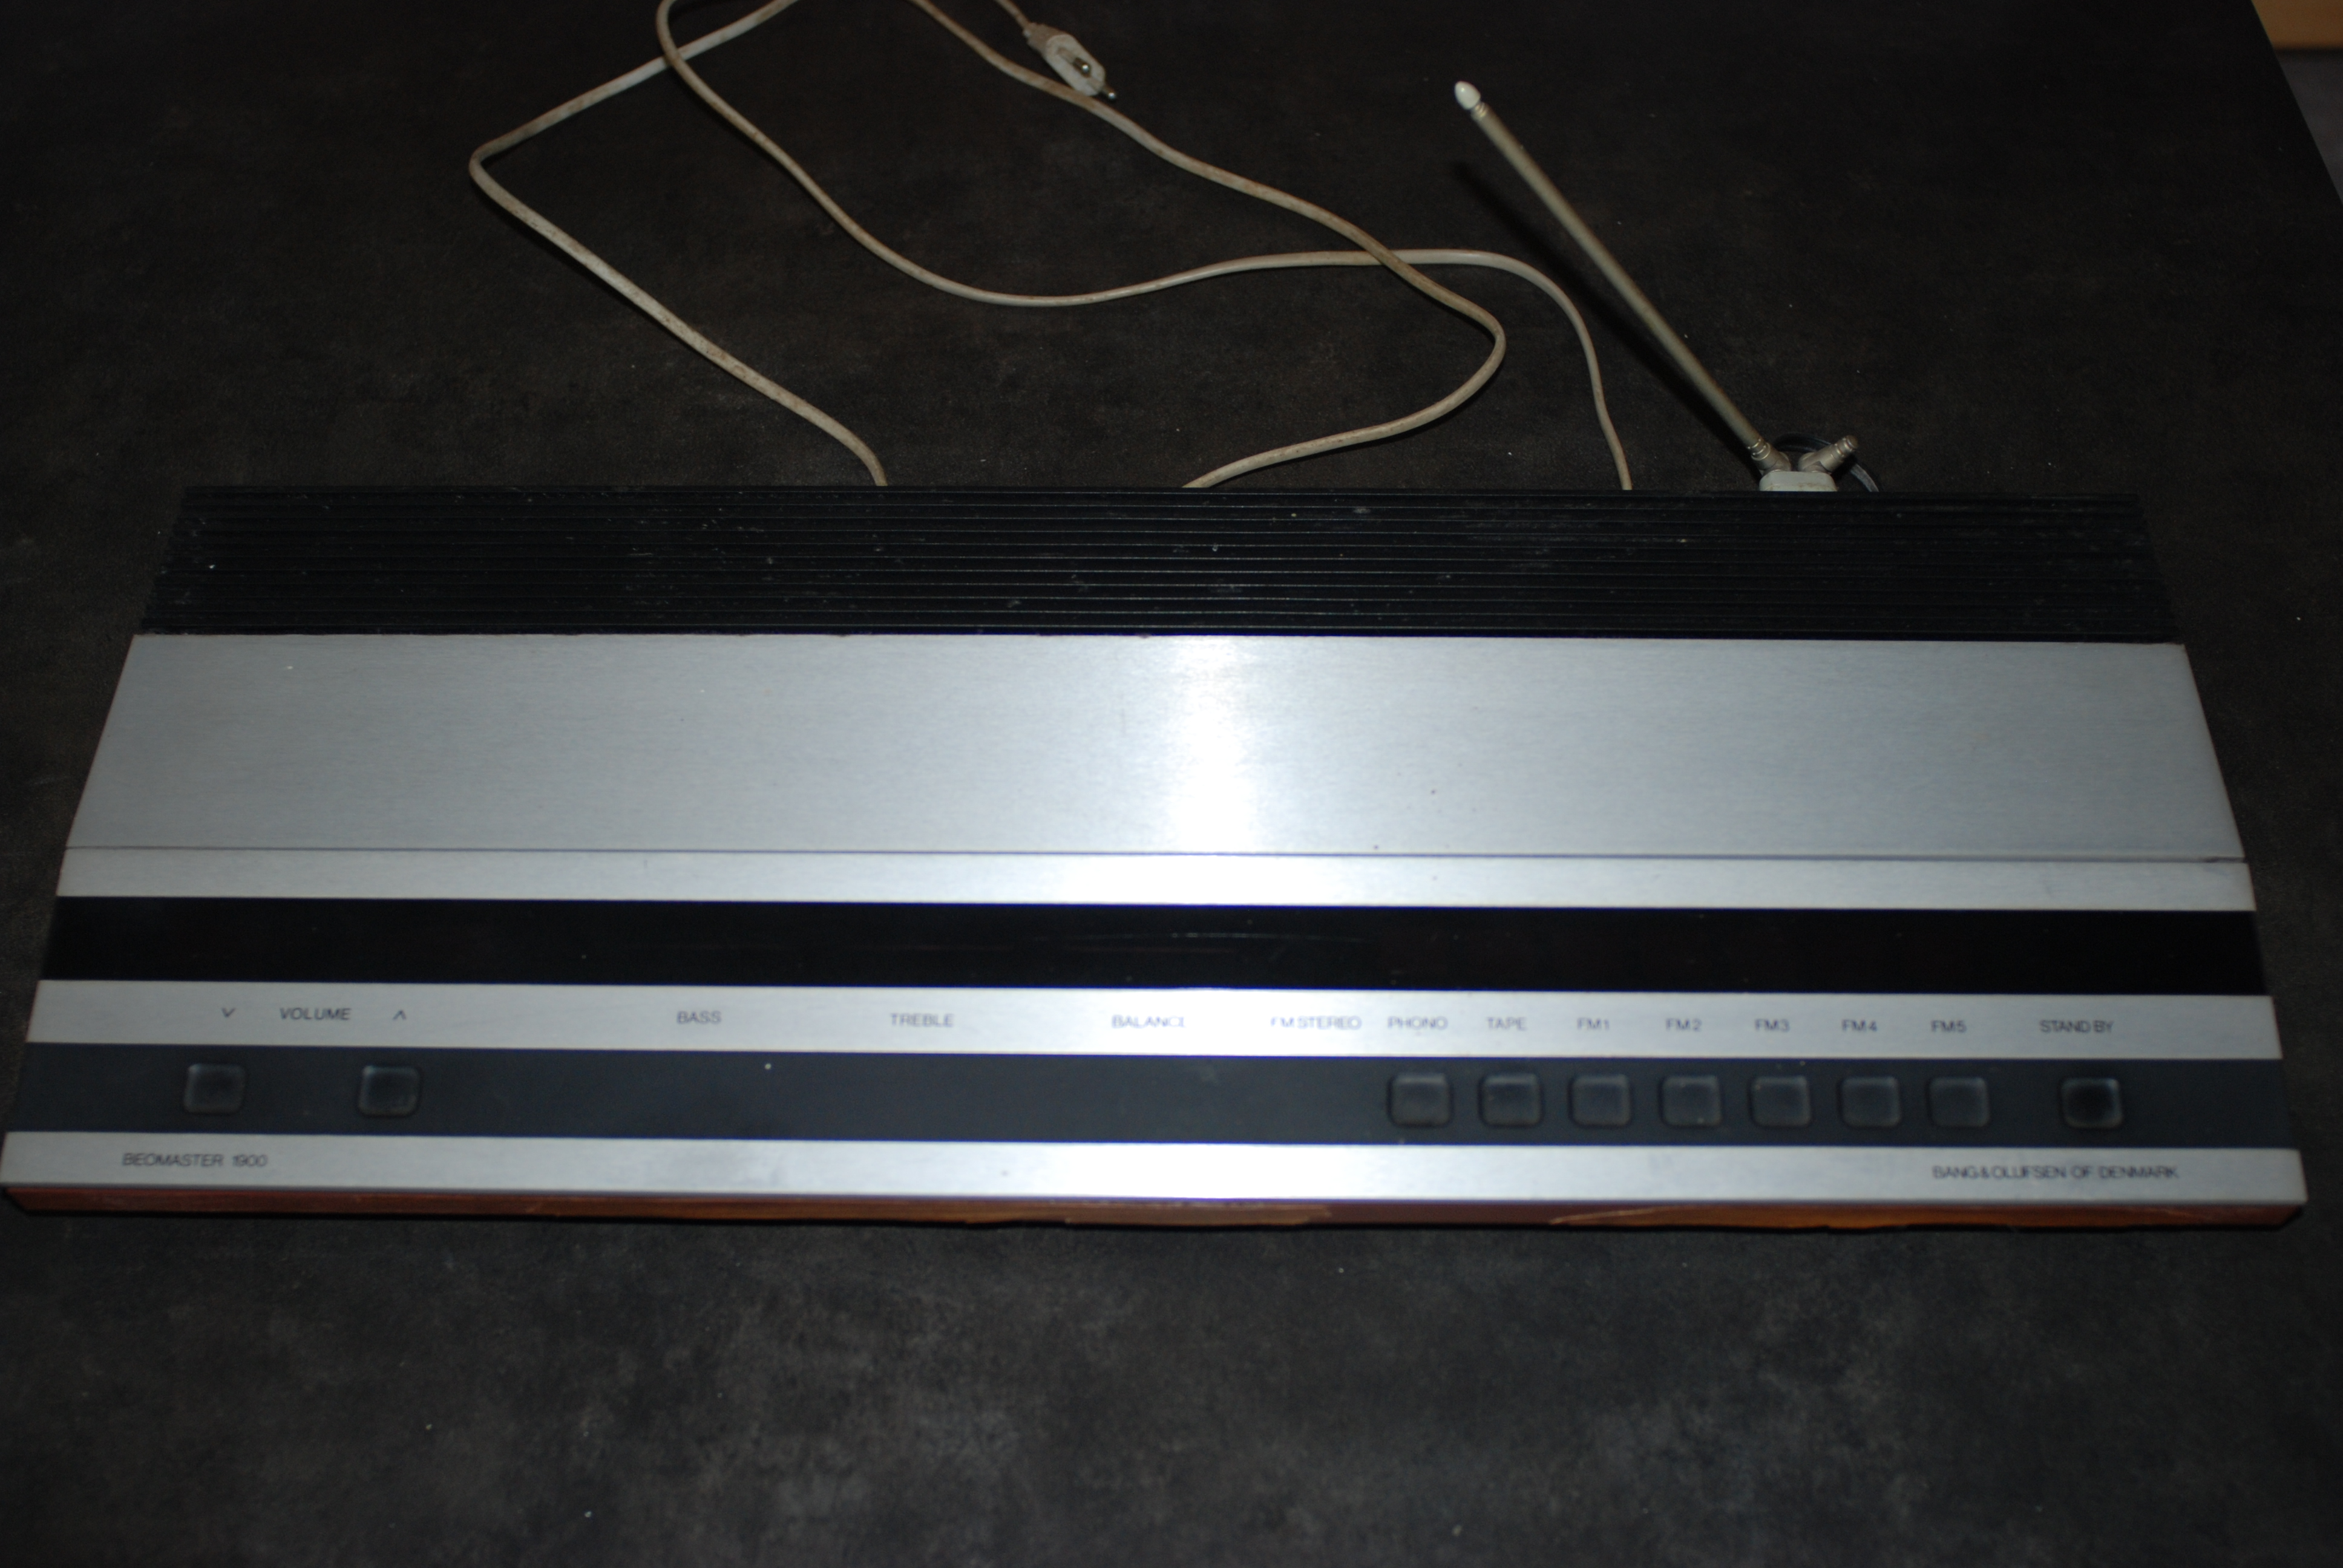 bang olufsen beomaster 1900 image 1033516 audiofanzine. Black Bedroom Furniture Sets. Home Design Ideas